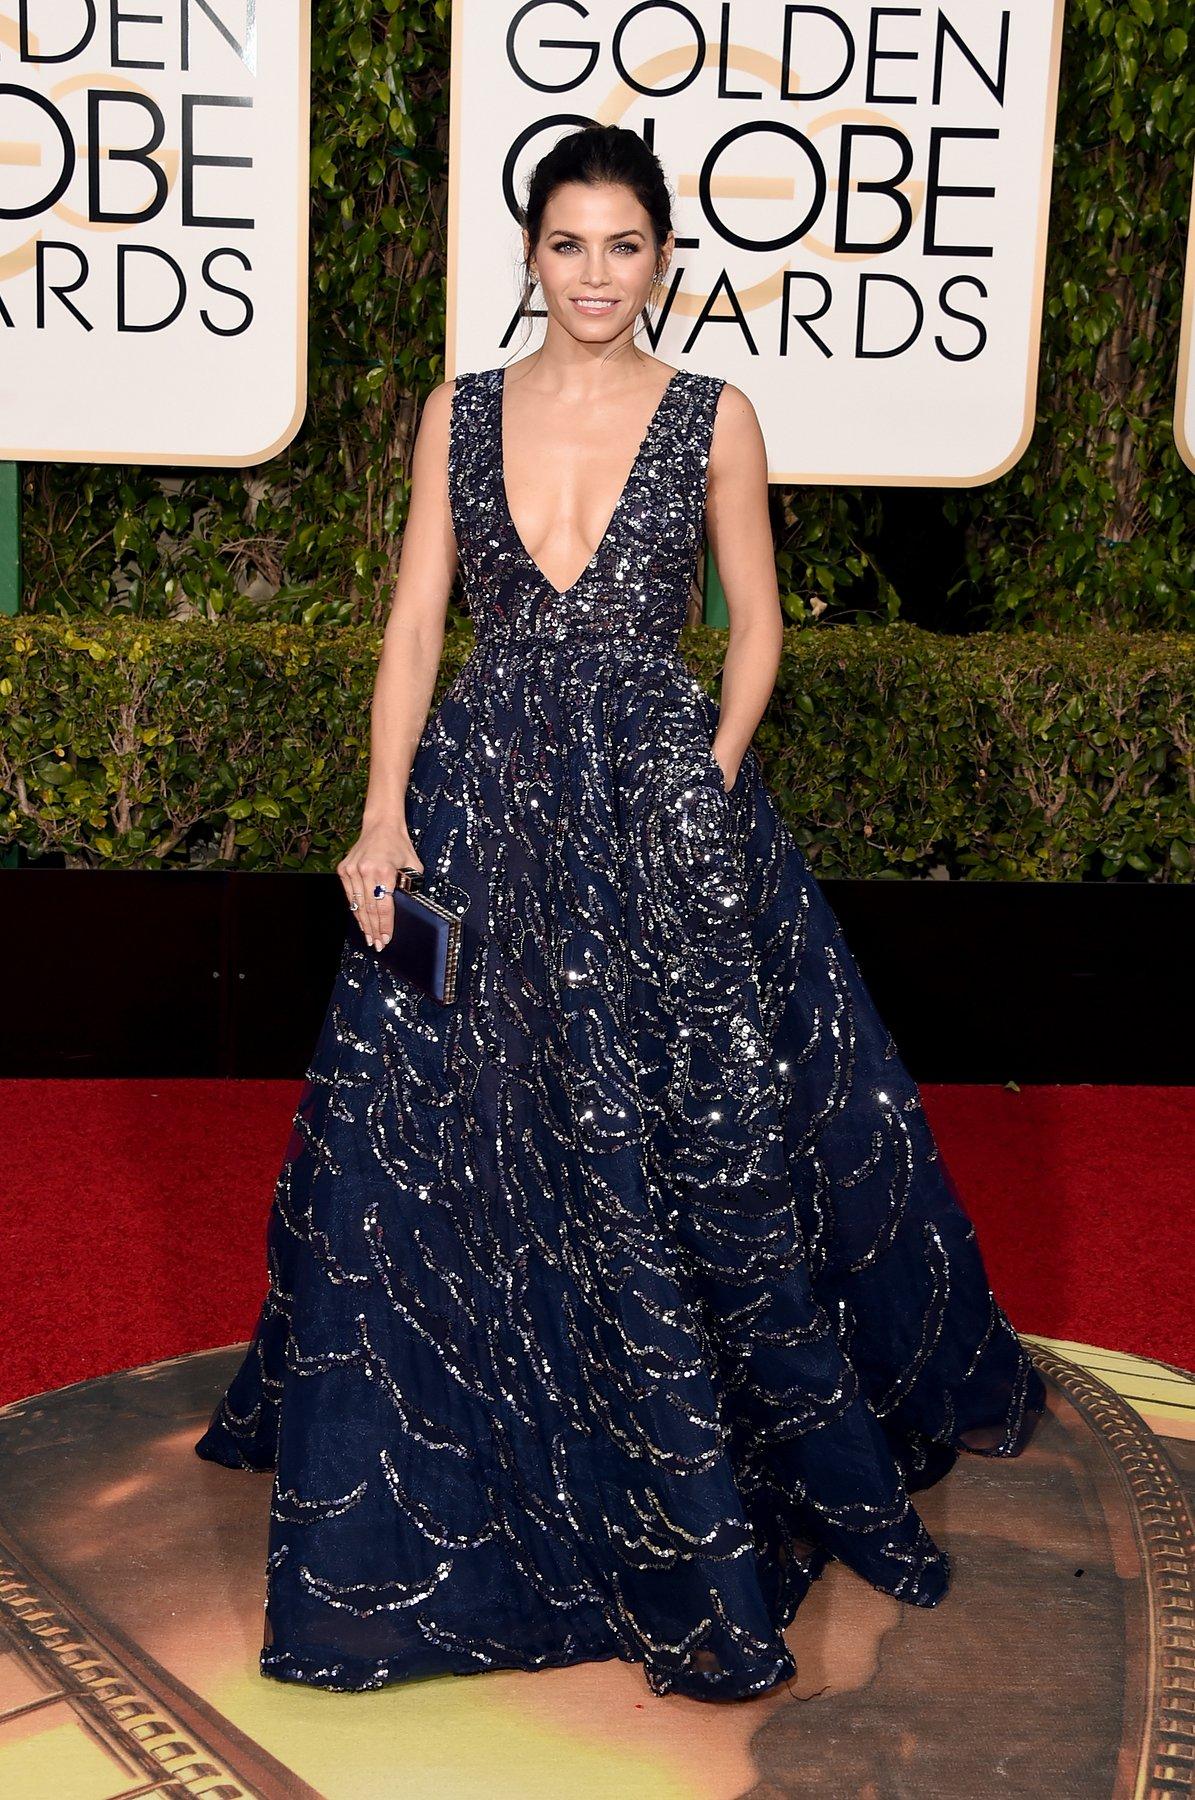 Tremendous Golden Globe 2016 Celebrity Hairstyles Amp Best Looks Hairstyles Hairstyles For Men Maxibearus